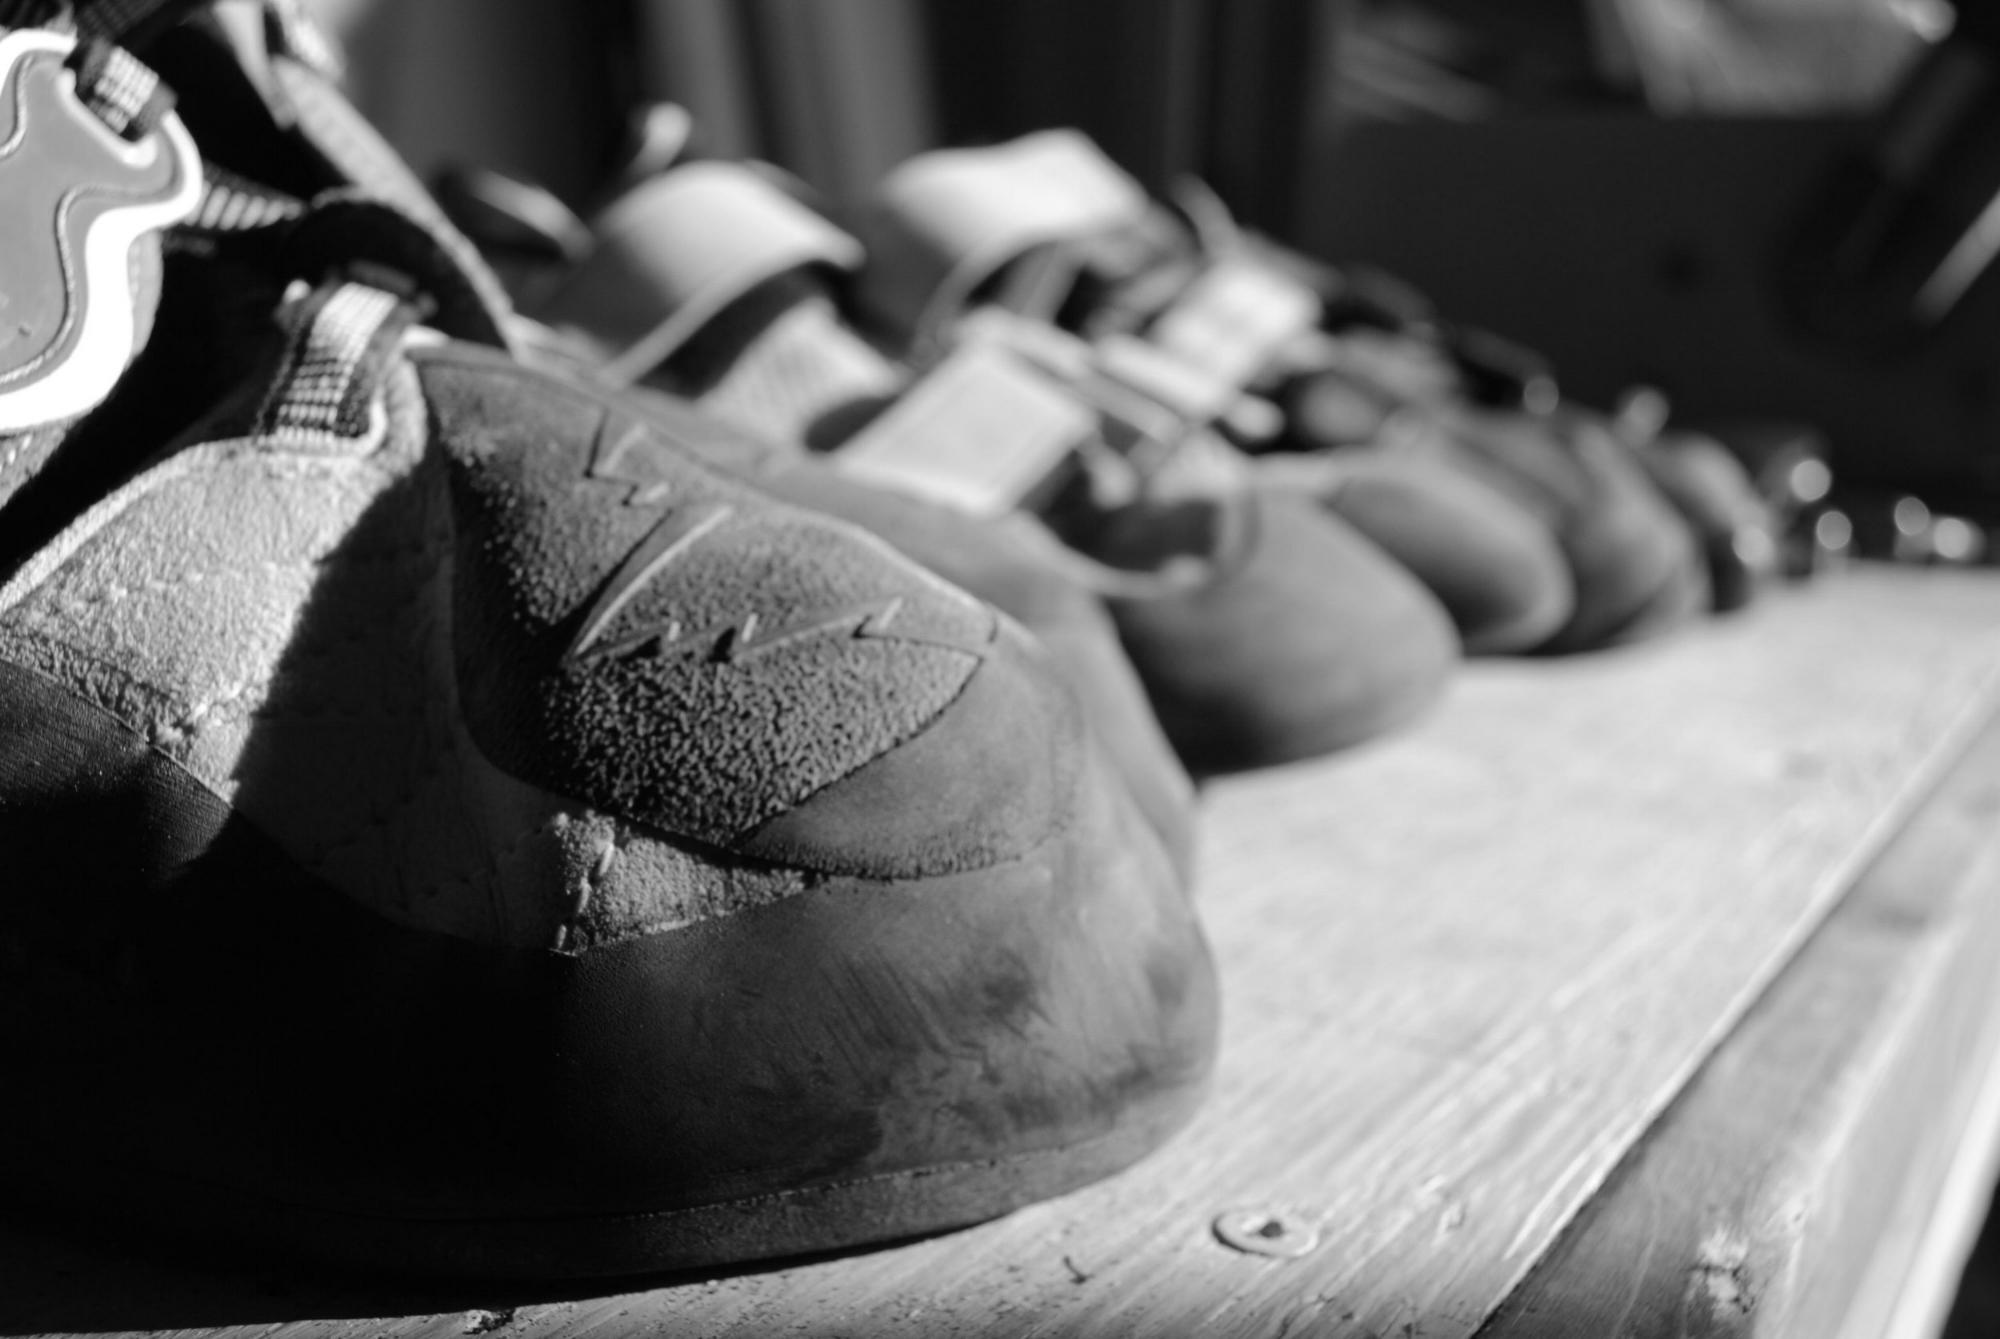 Performance Climbing Shoe Resoles - Professional Climbing Shoe Resoling and RepairServing all of Canada